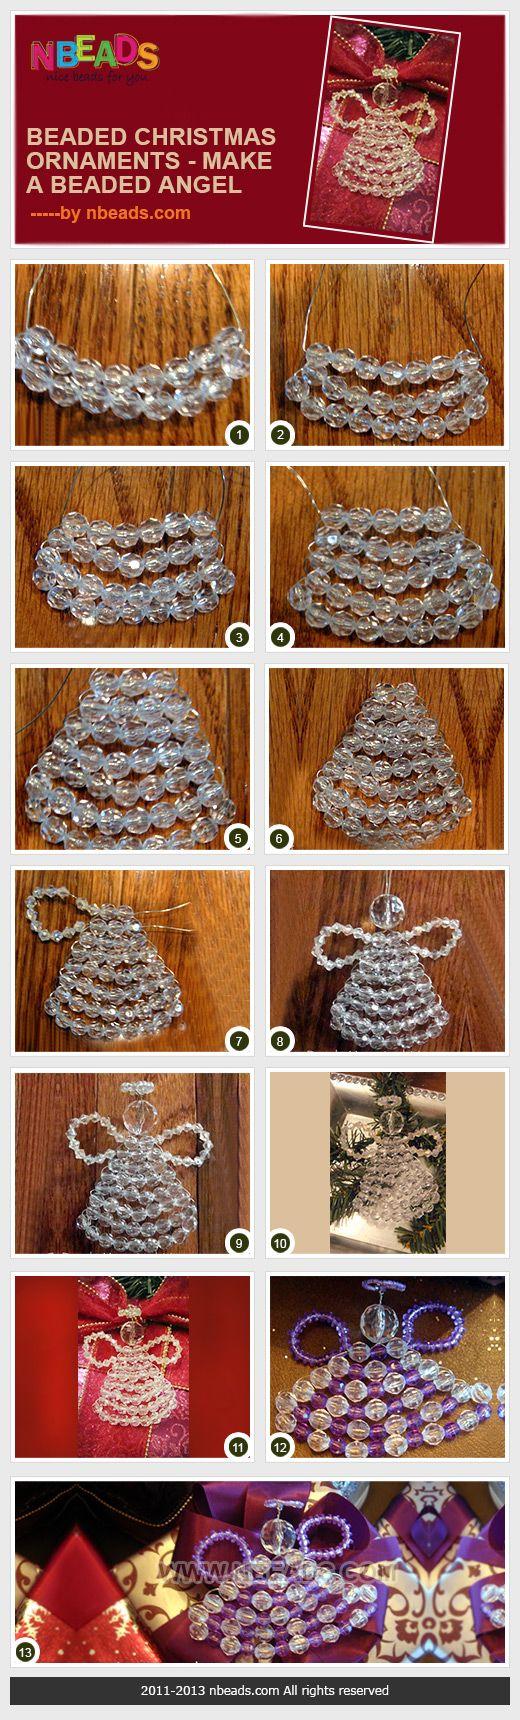 beaded christmas ornaments - make a beaded angel